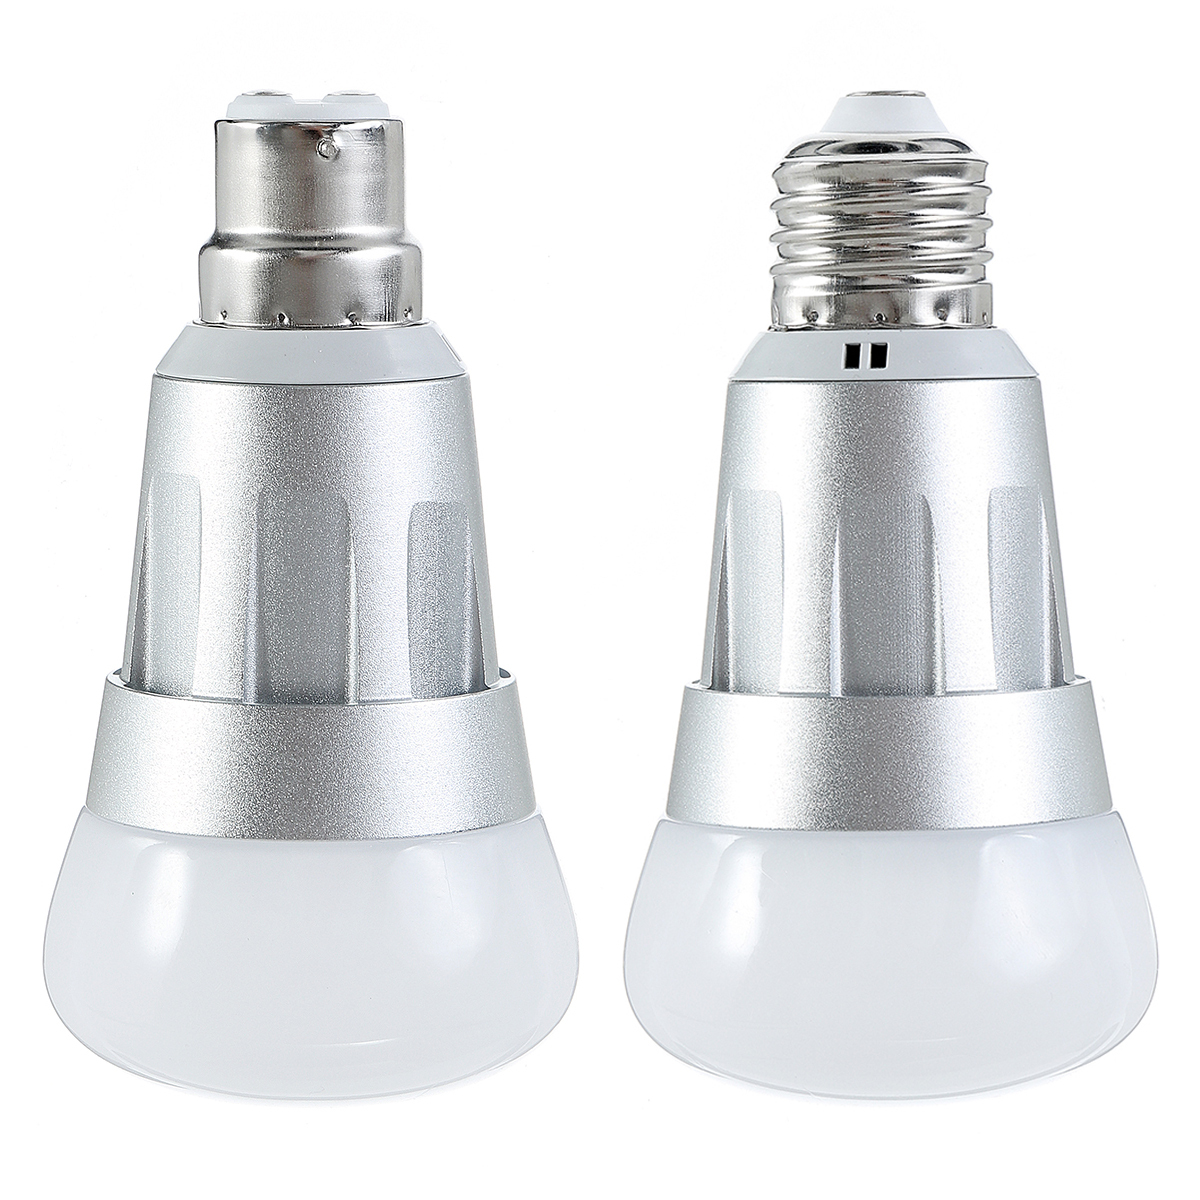 E27 B22 7W RGB+W WiFi APP Smart LED Light Bulb Work With Echo Alexa Google Home